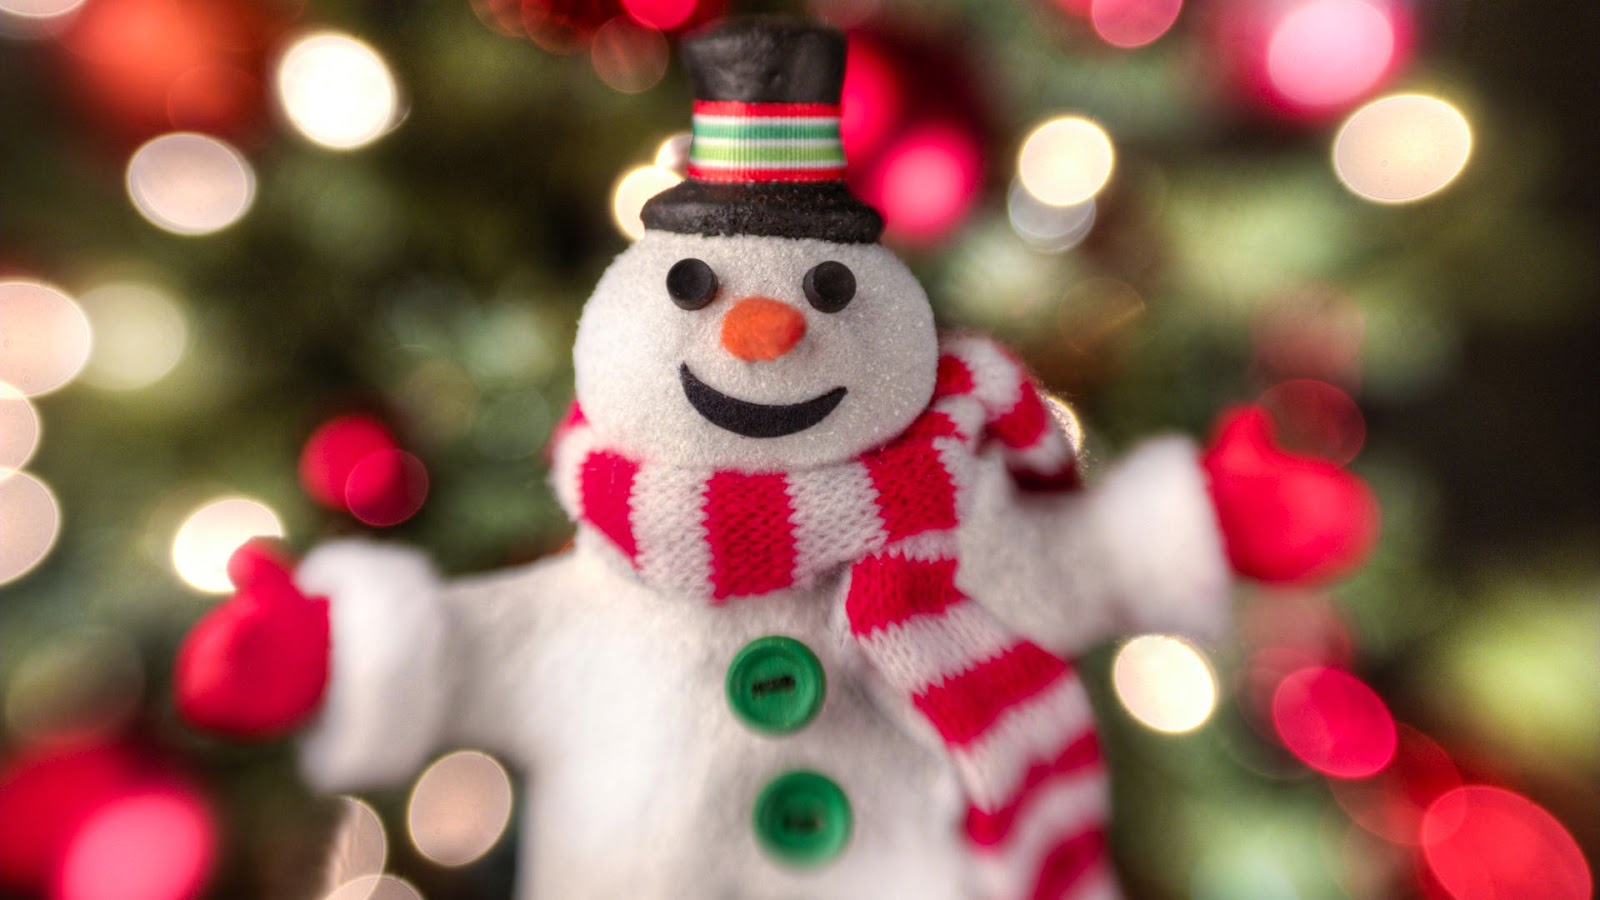 snowman-wallpaper-HD-for-desktop-Mac-laptop-mobile-tablet-free-download.jpg